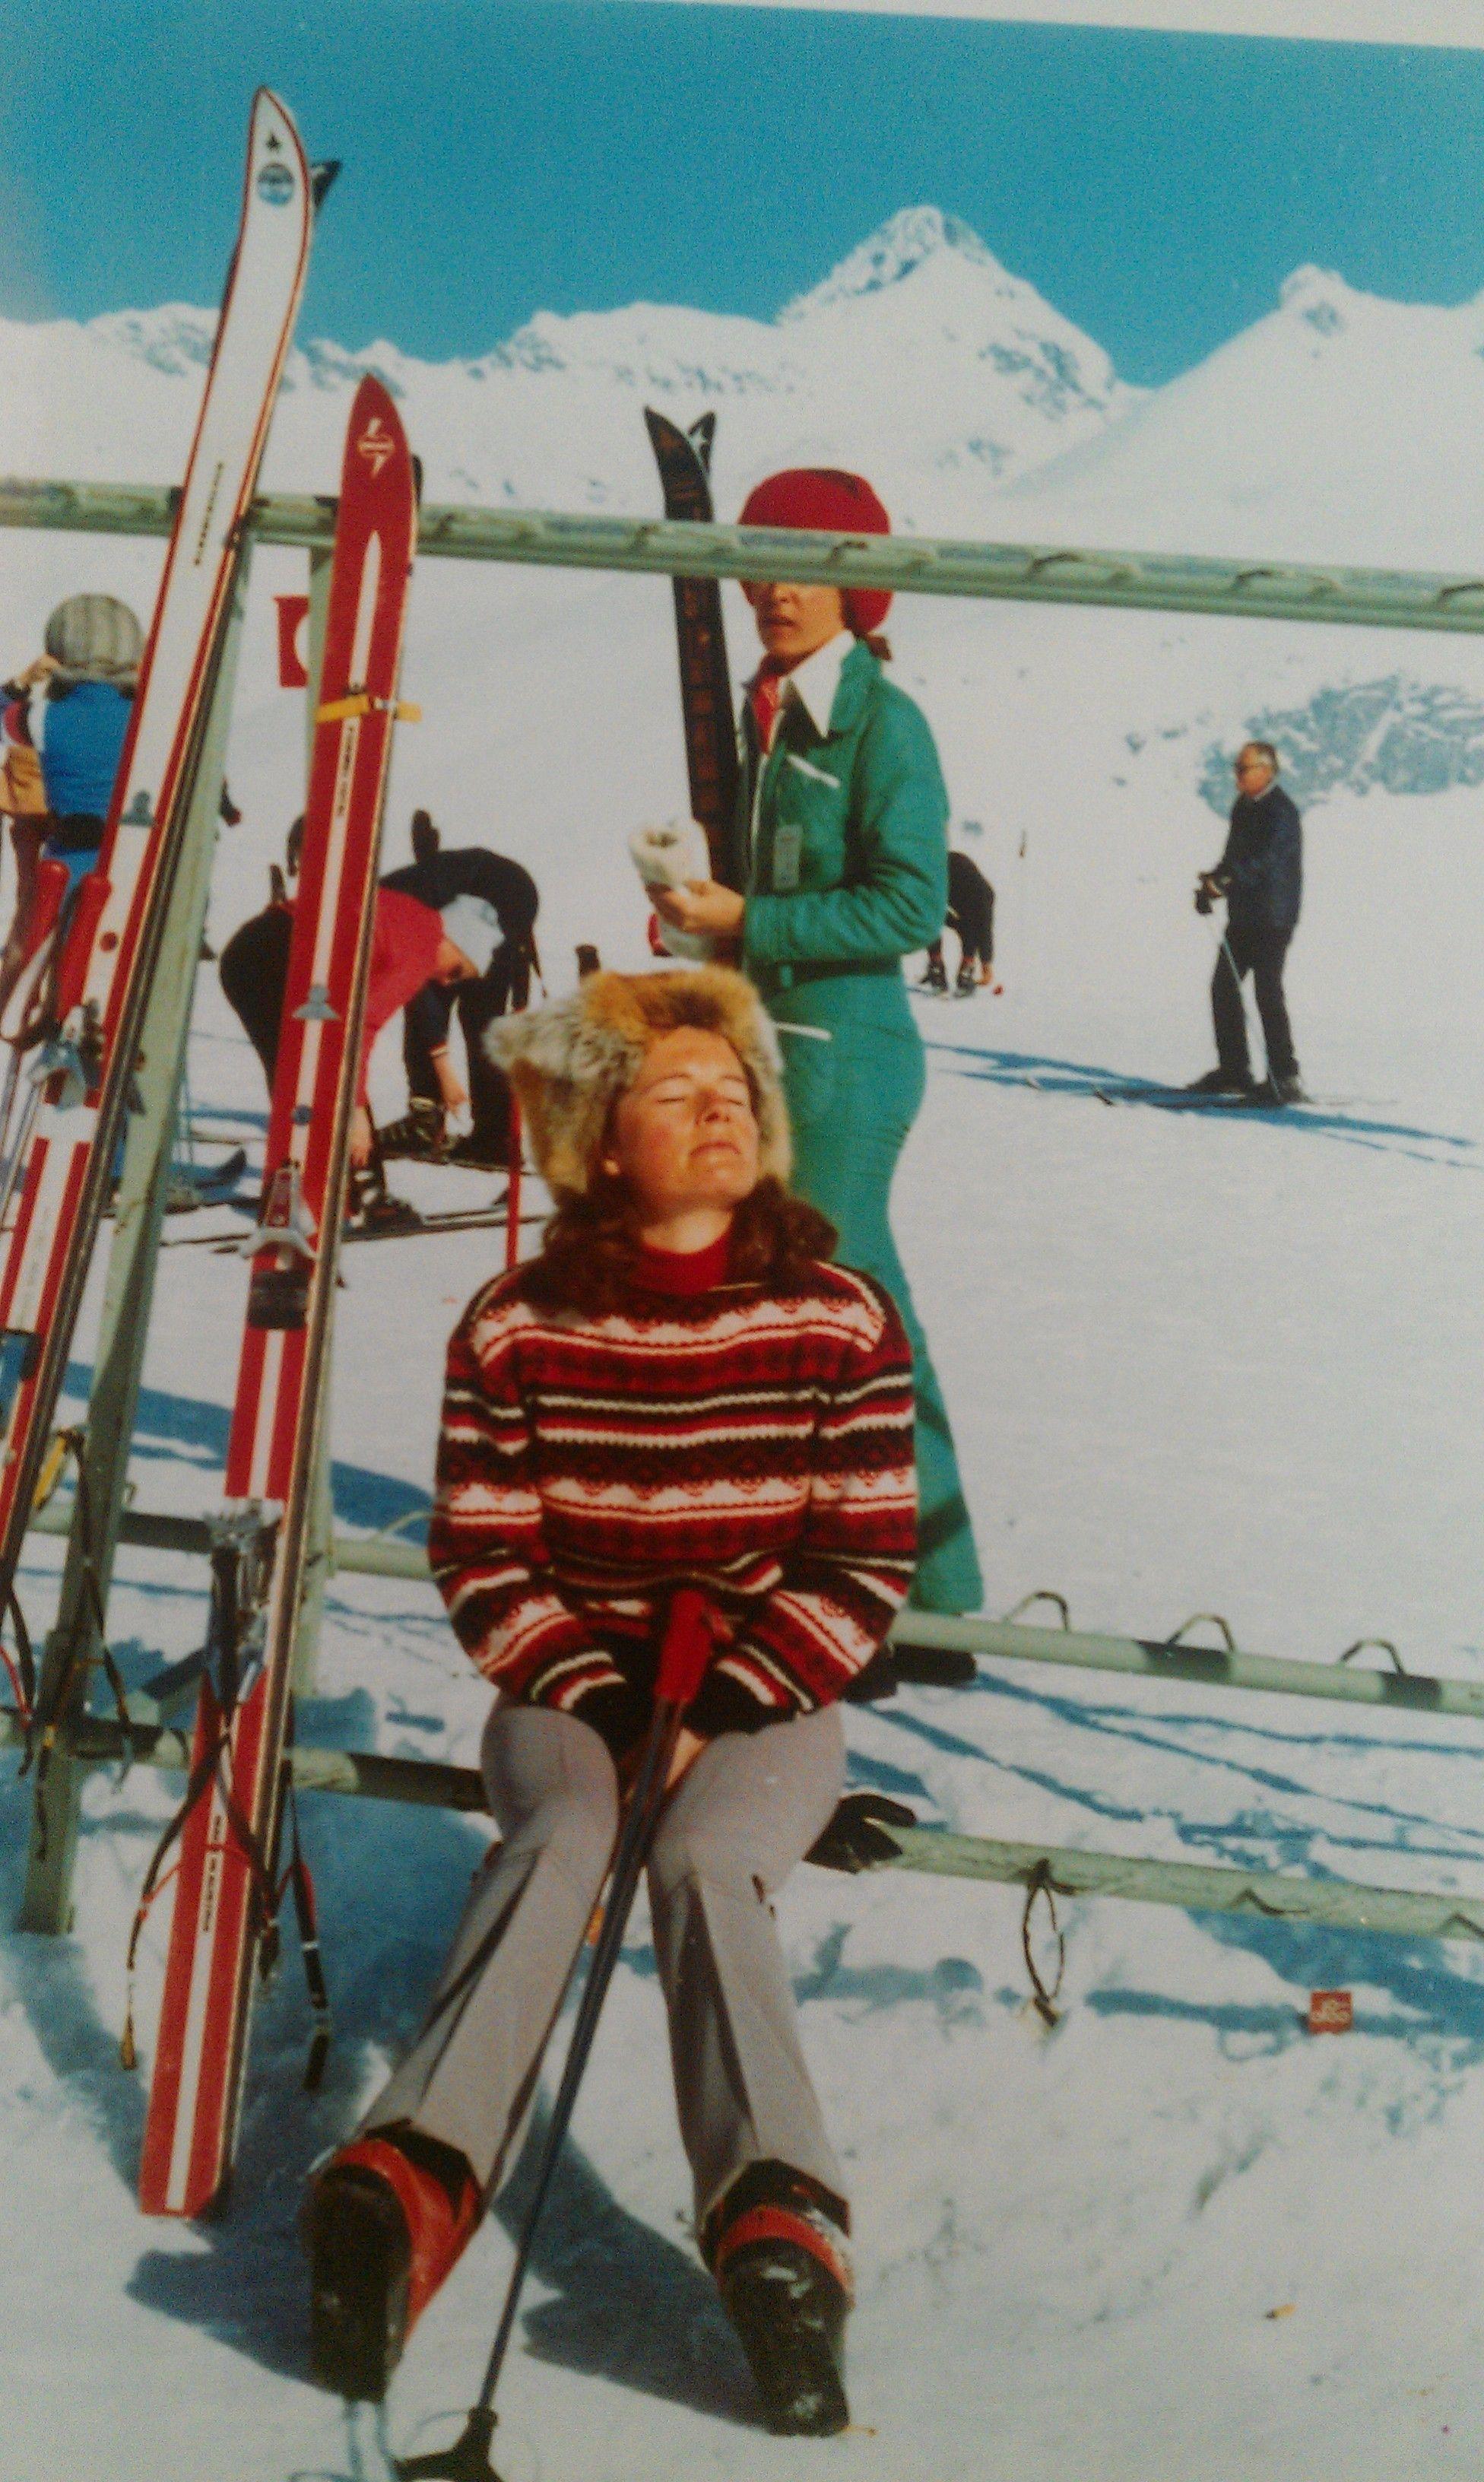 60 S Vintage Ski Verbier Where I Have Spent My First Winter Christmas Holidays Vintage Ski Ski Culture Ski Fashion